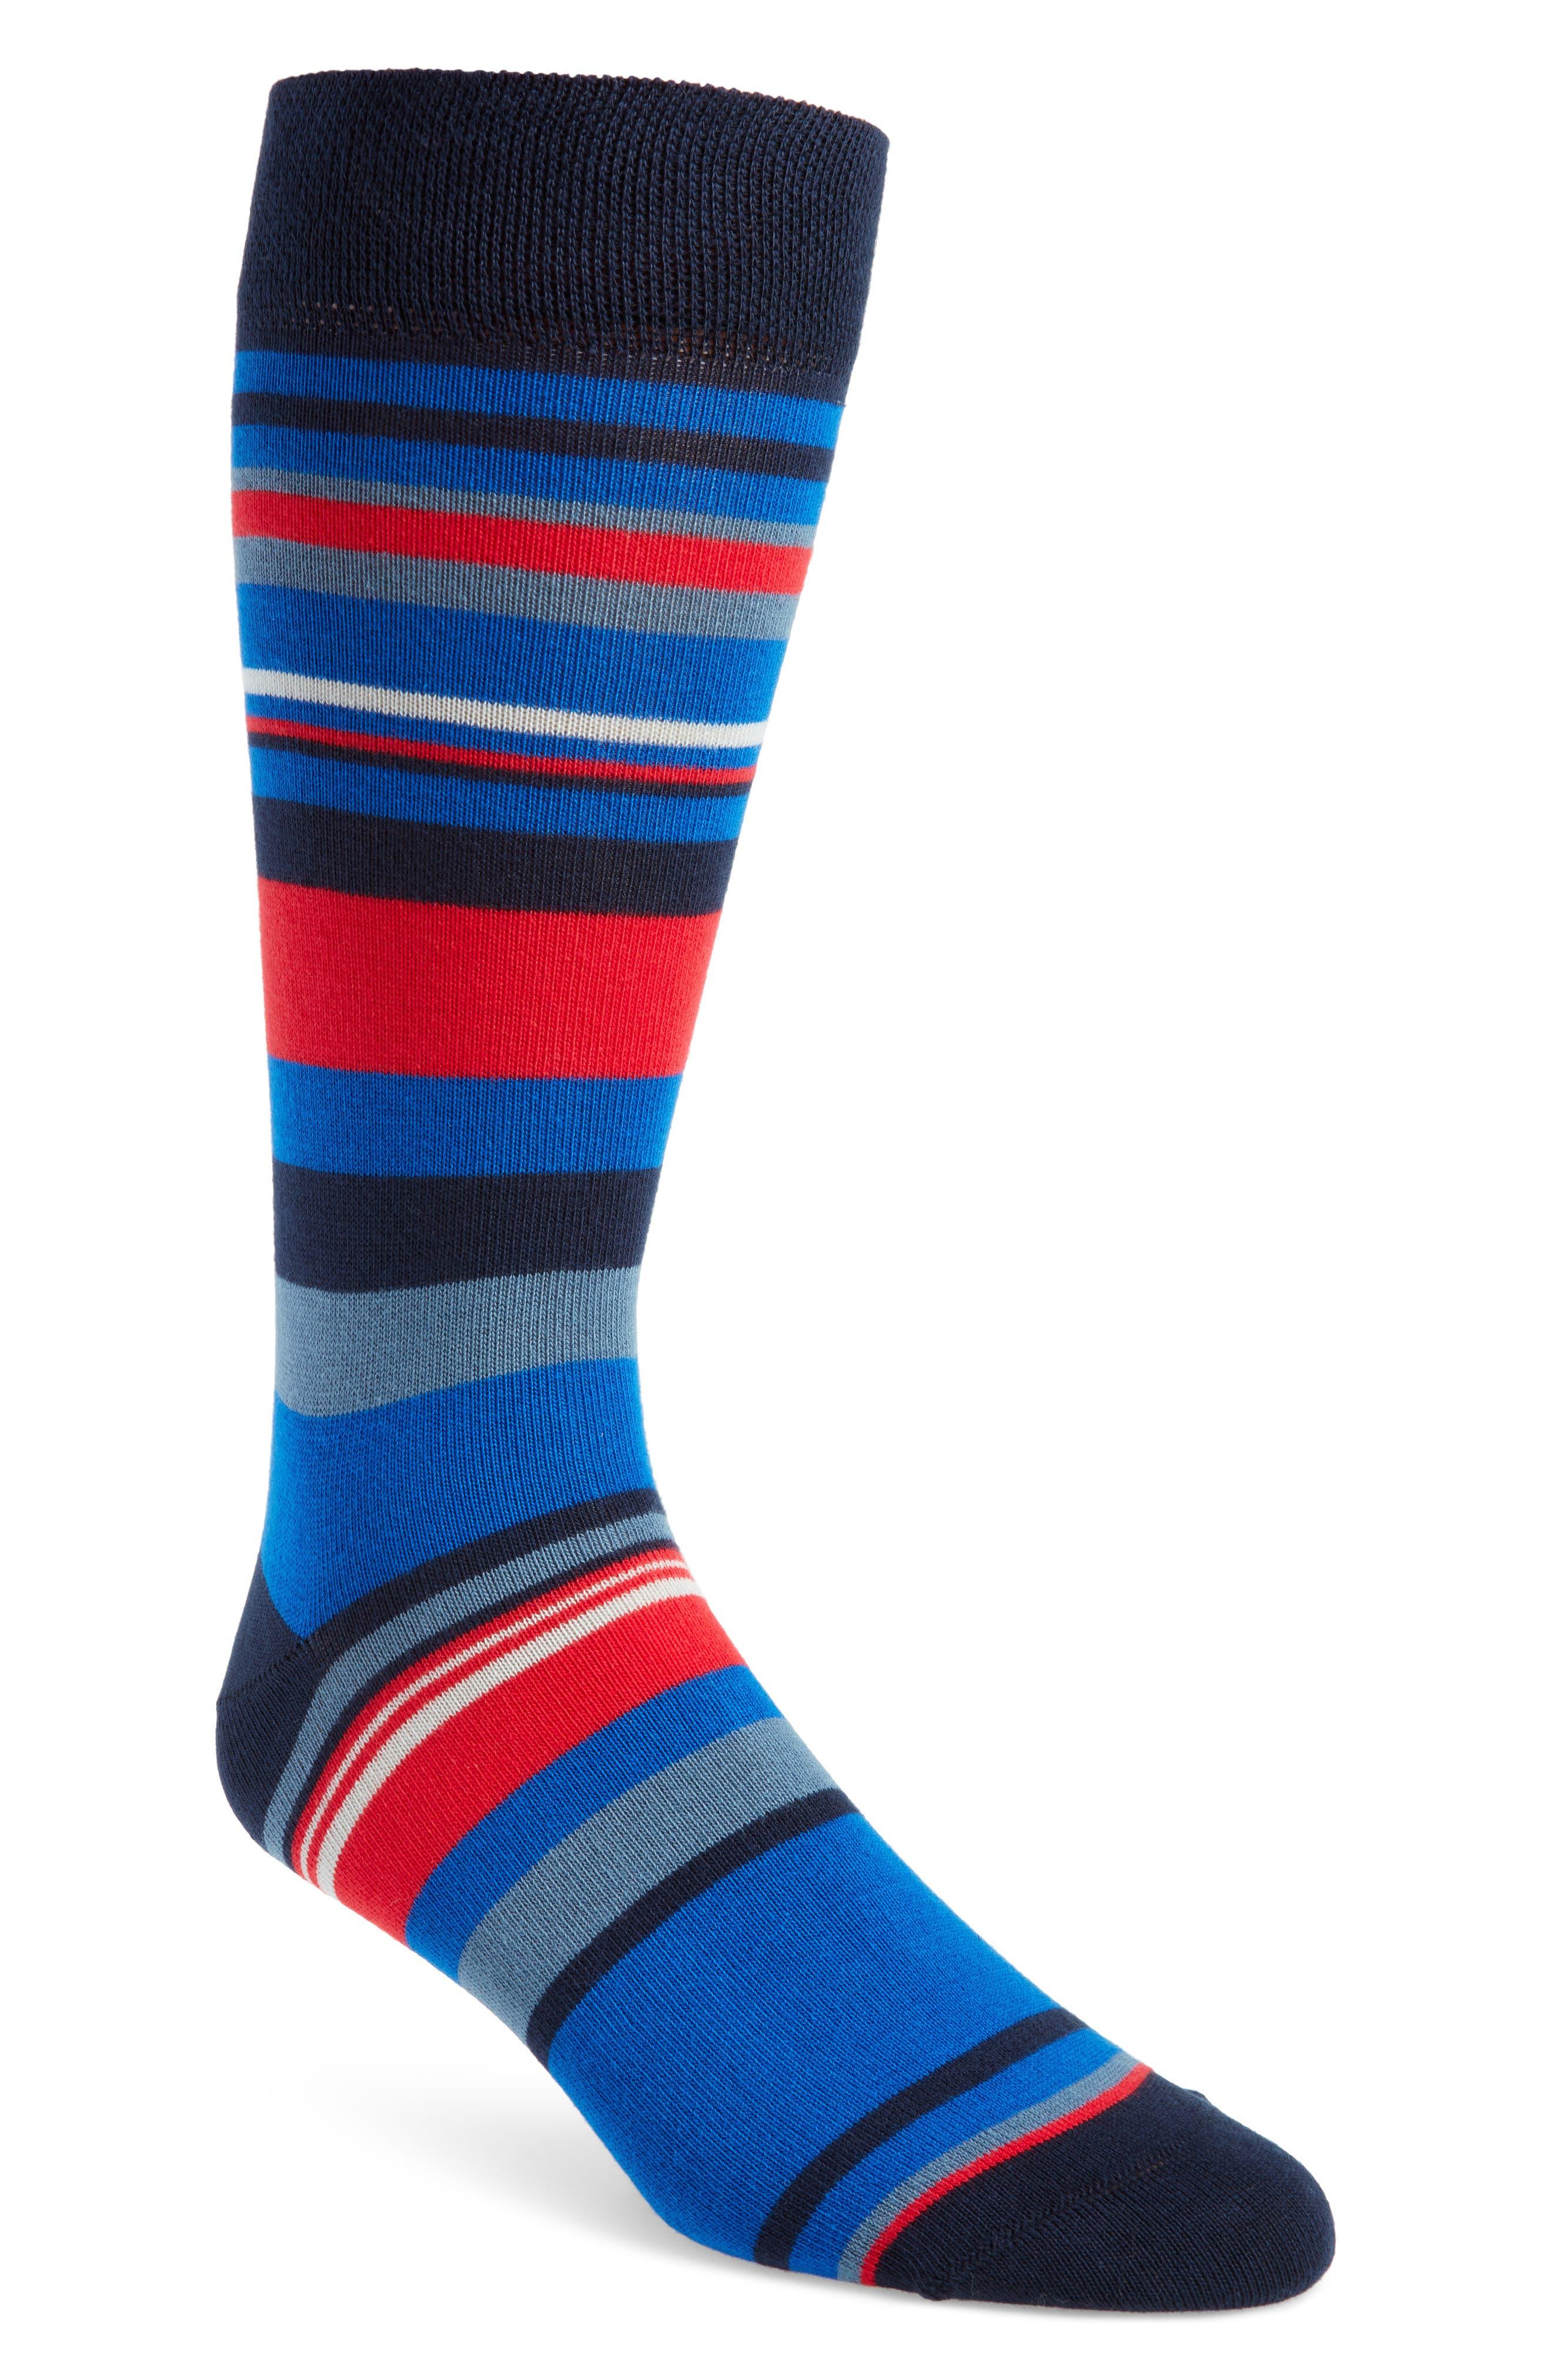 Harisli Stripe Socks,                             Main thumbnail 1, color,                             NAVY